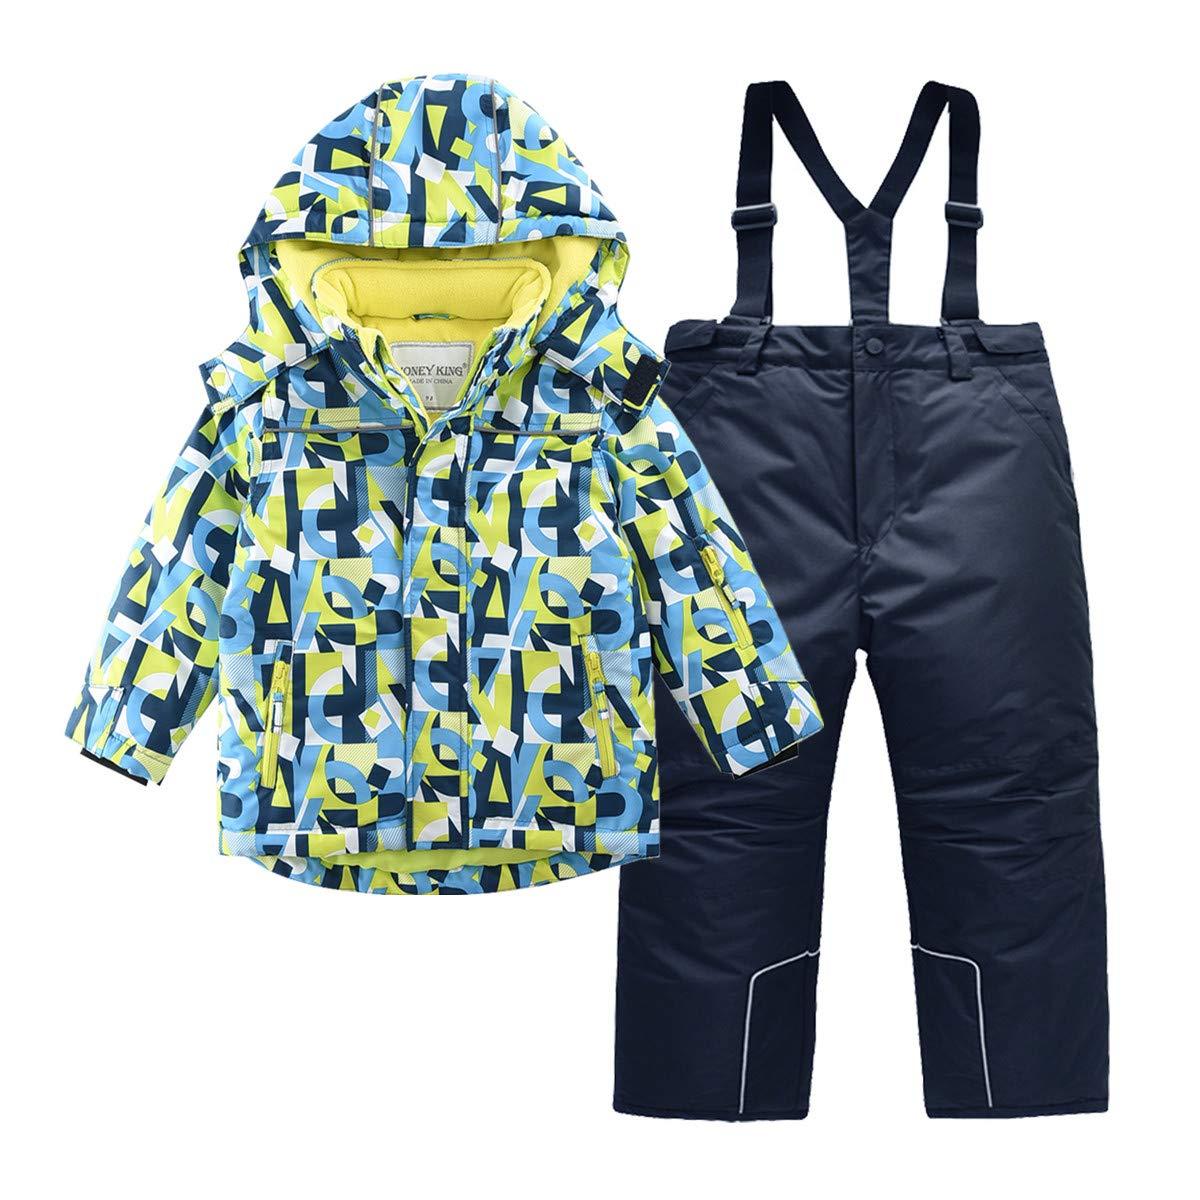 Hiheart Boys Snowsuit Winter Ski Jacket and Pants Set 8-9 Years Blue